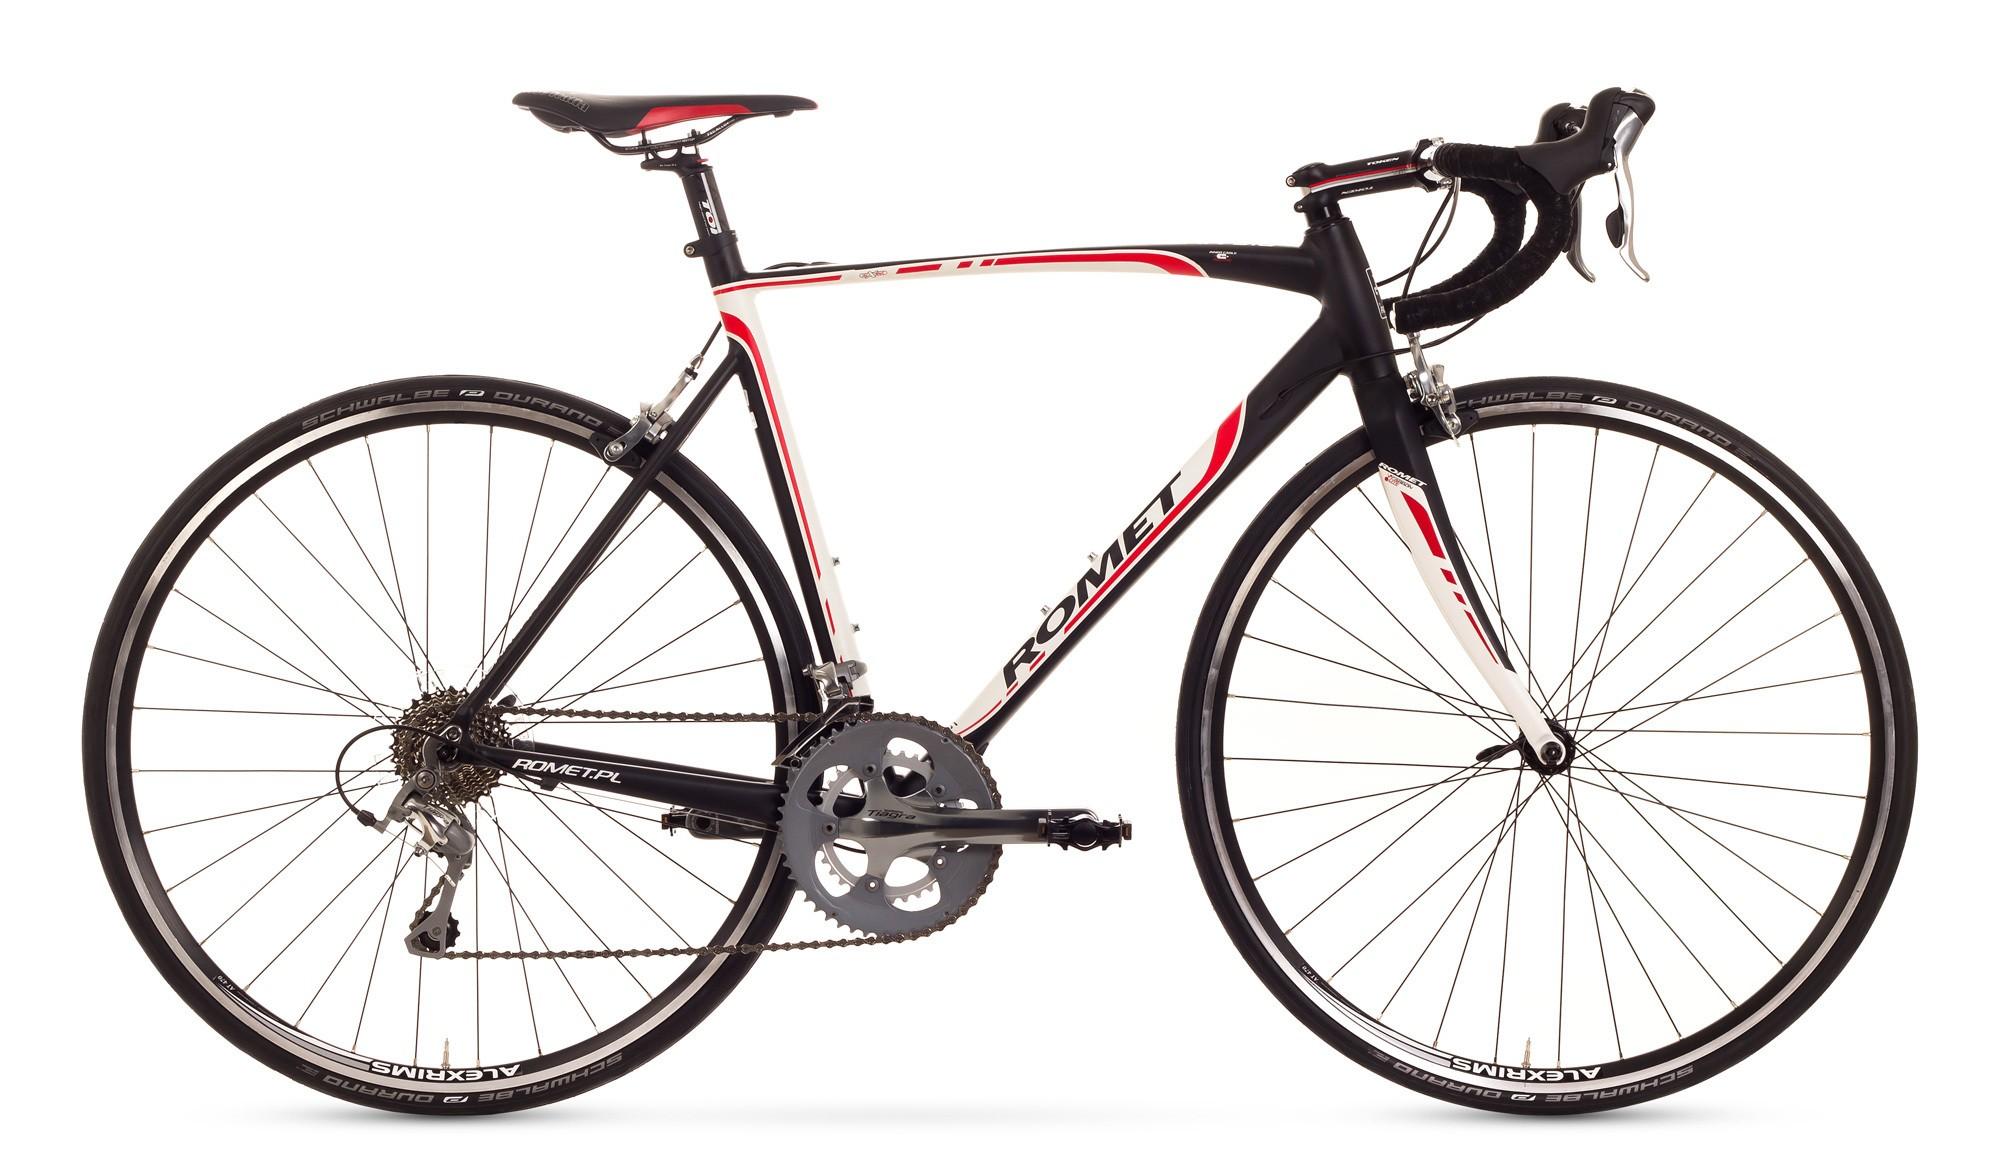 Bicicleta cursiera Romet Huragan 3.0 - alb-negru-rosu